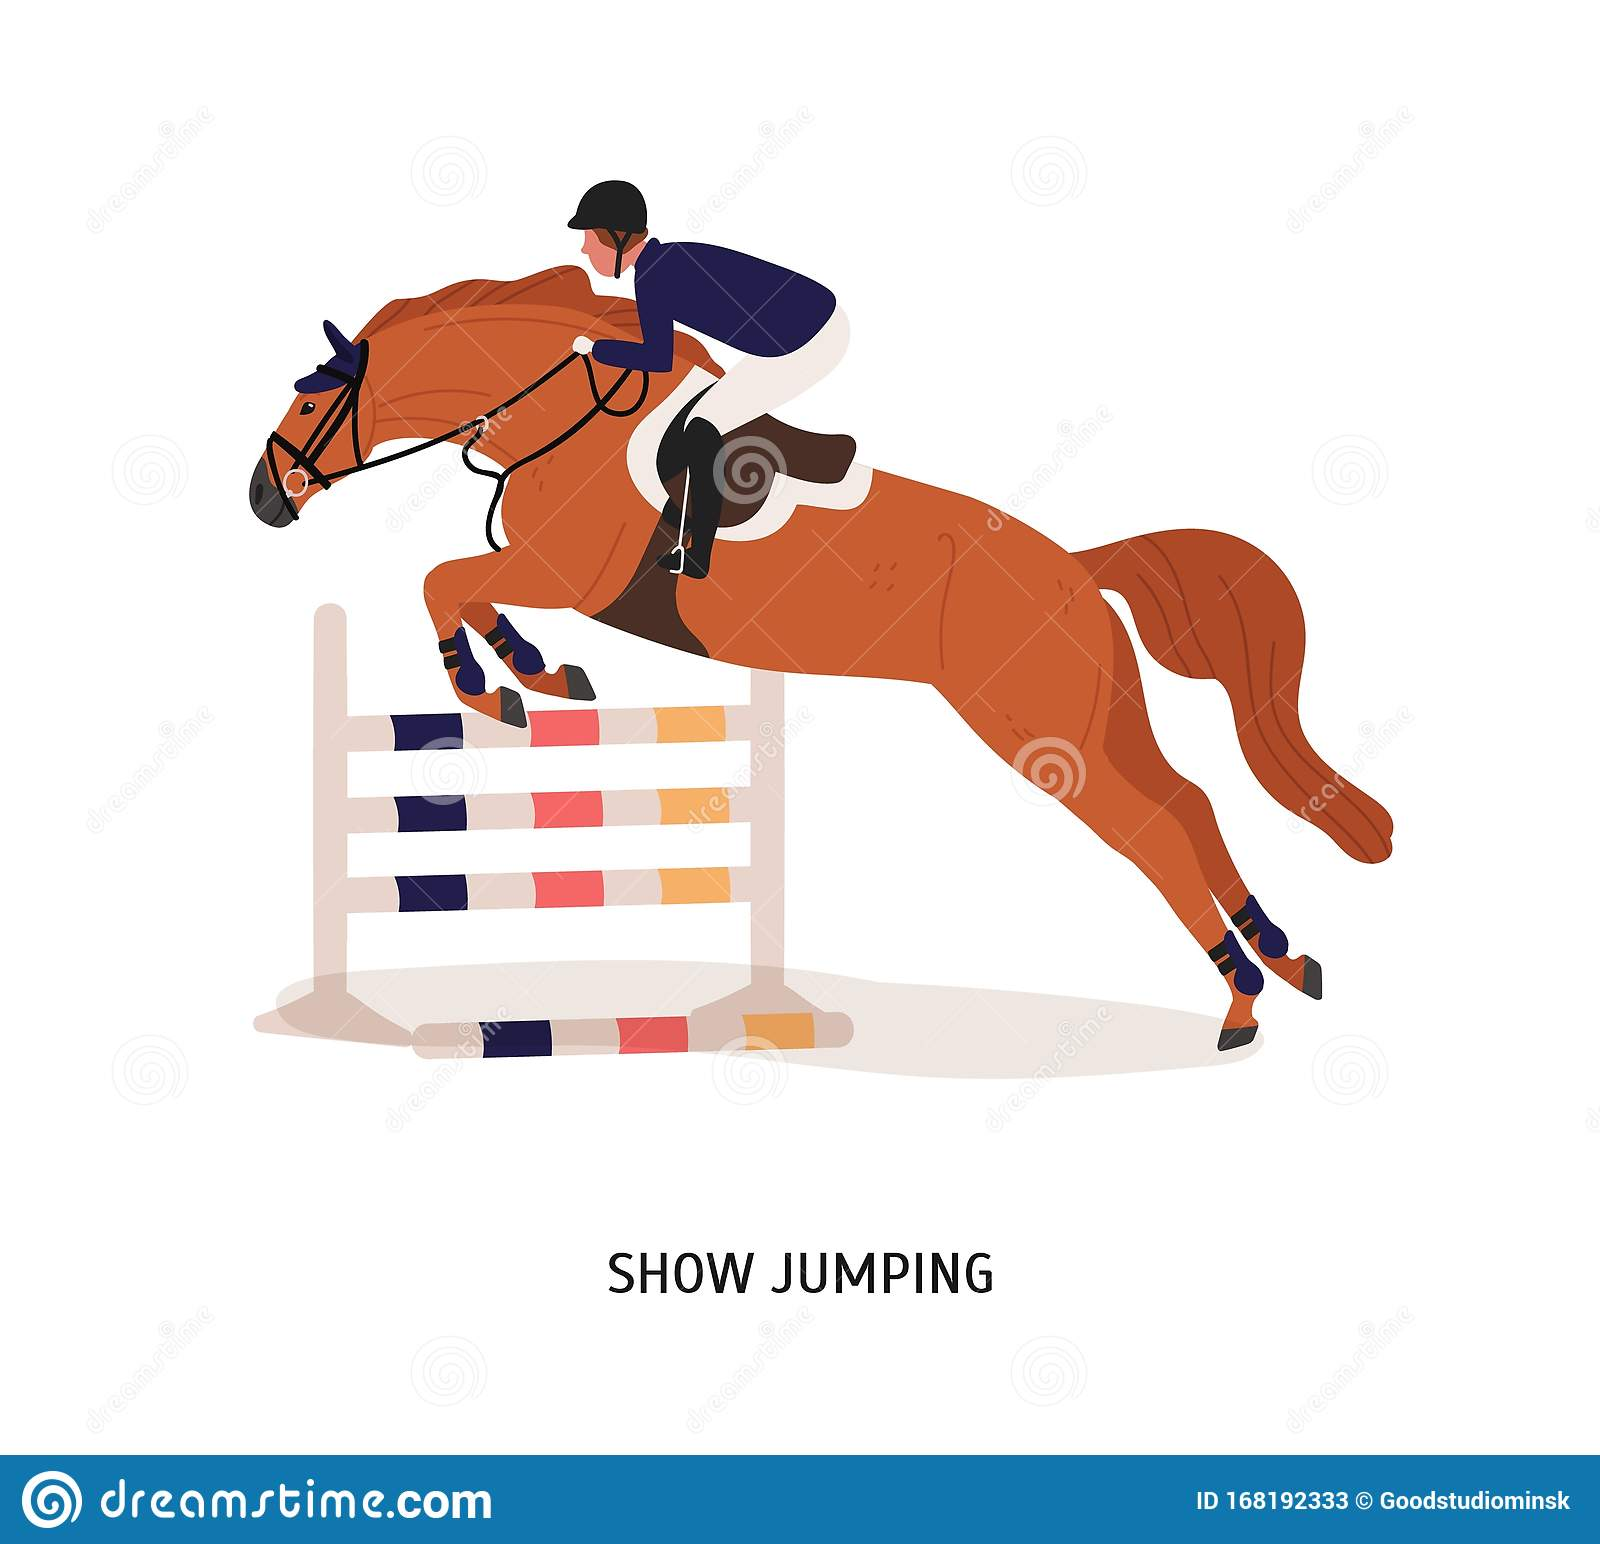 Show Jumping Flat Vector Illustration Horse Rider Athlete Cartoon Character Equestrian Show Horseback Riding Stock Vector Illustration Of Horse Jockey 168192333